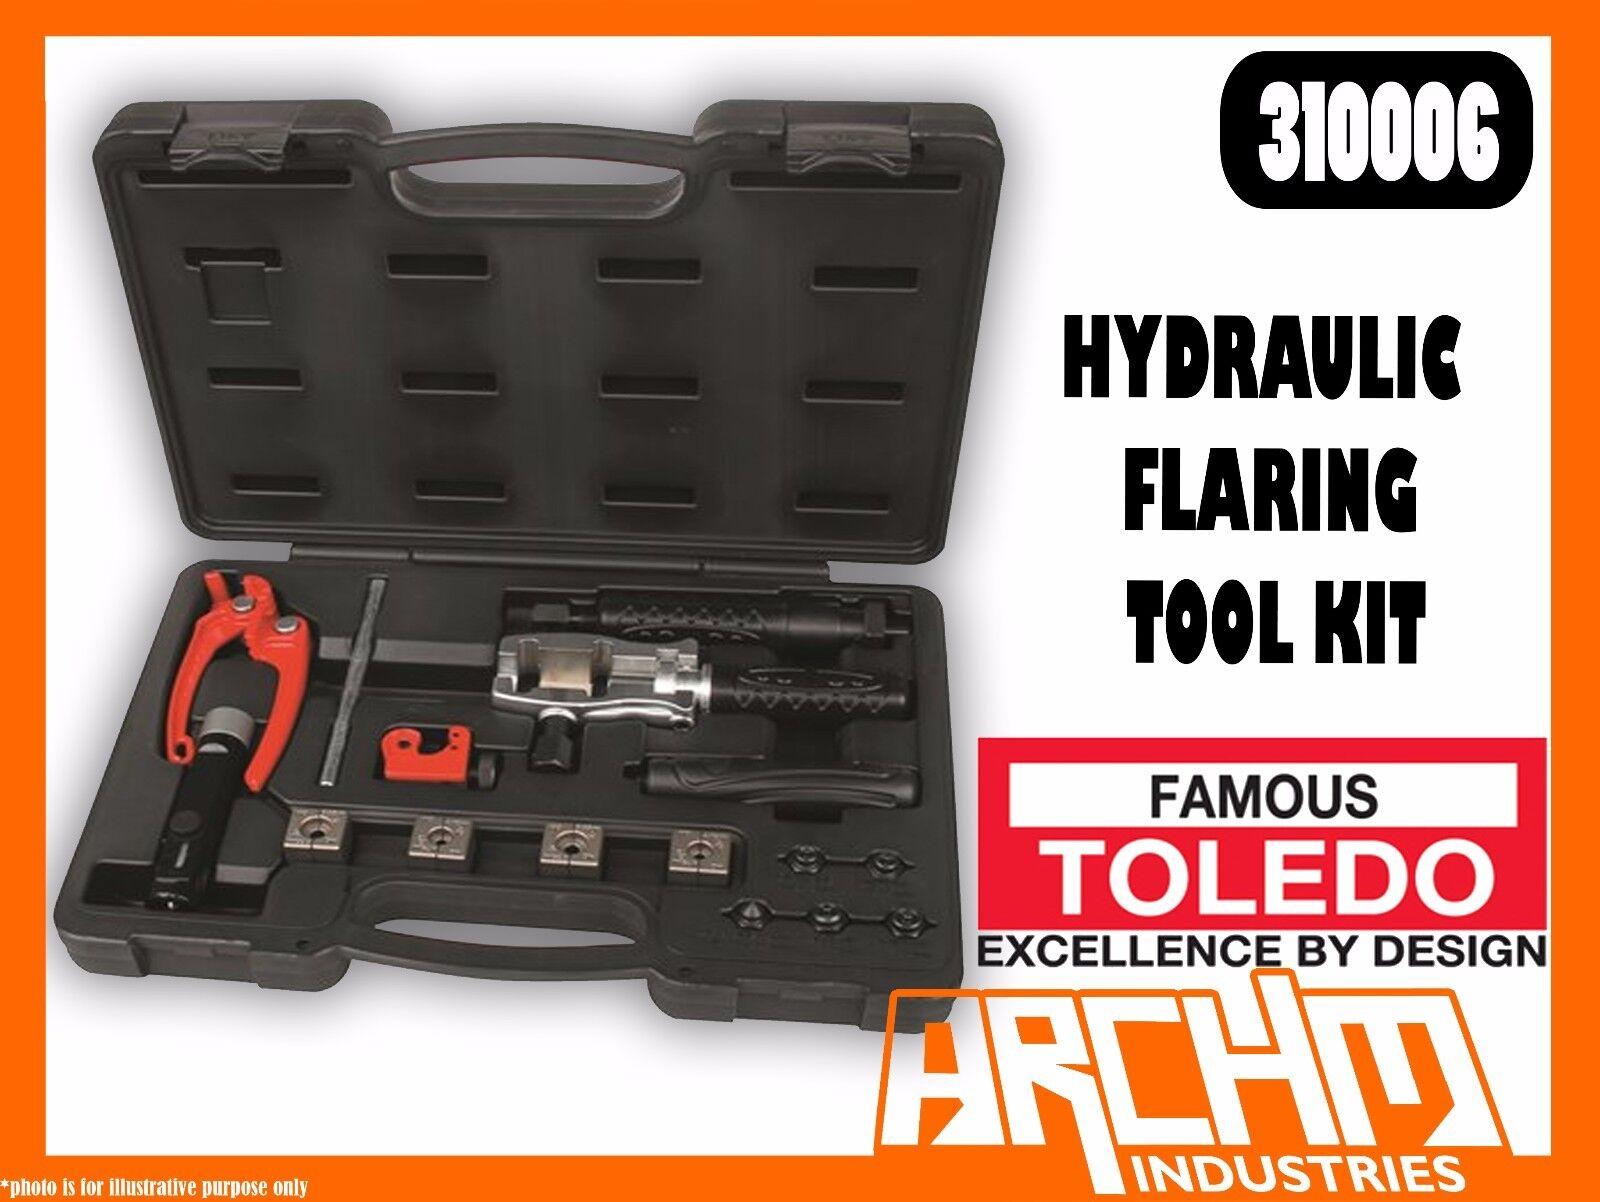 TOLEDO 310006 - HYDRAULIC PIPE FLARING TOOL KIT -  COPPER BRASS ALUMINIUM STEEL